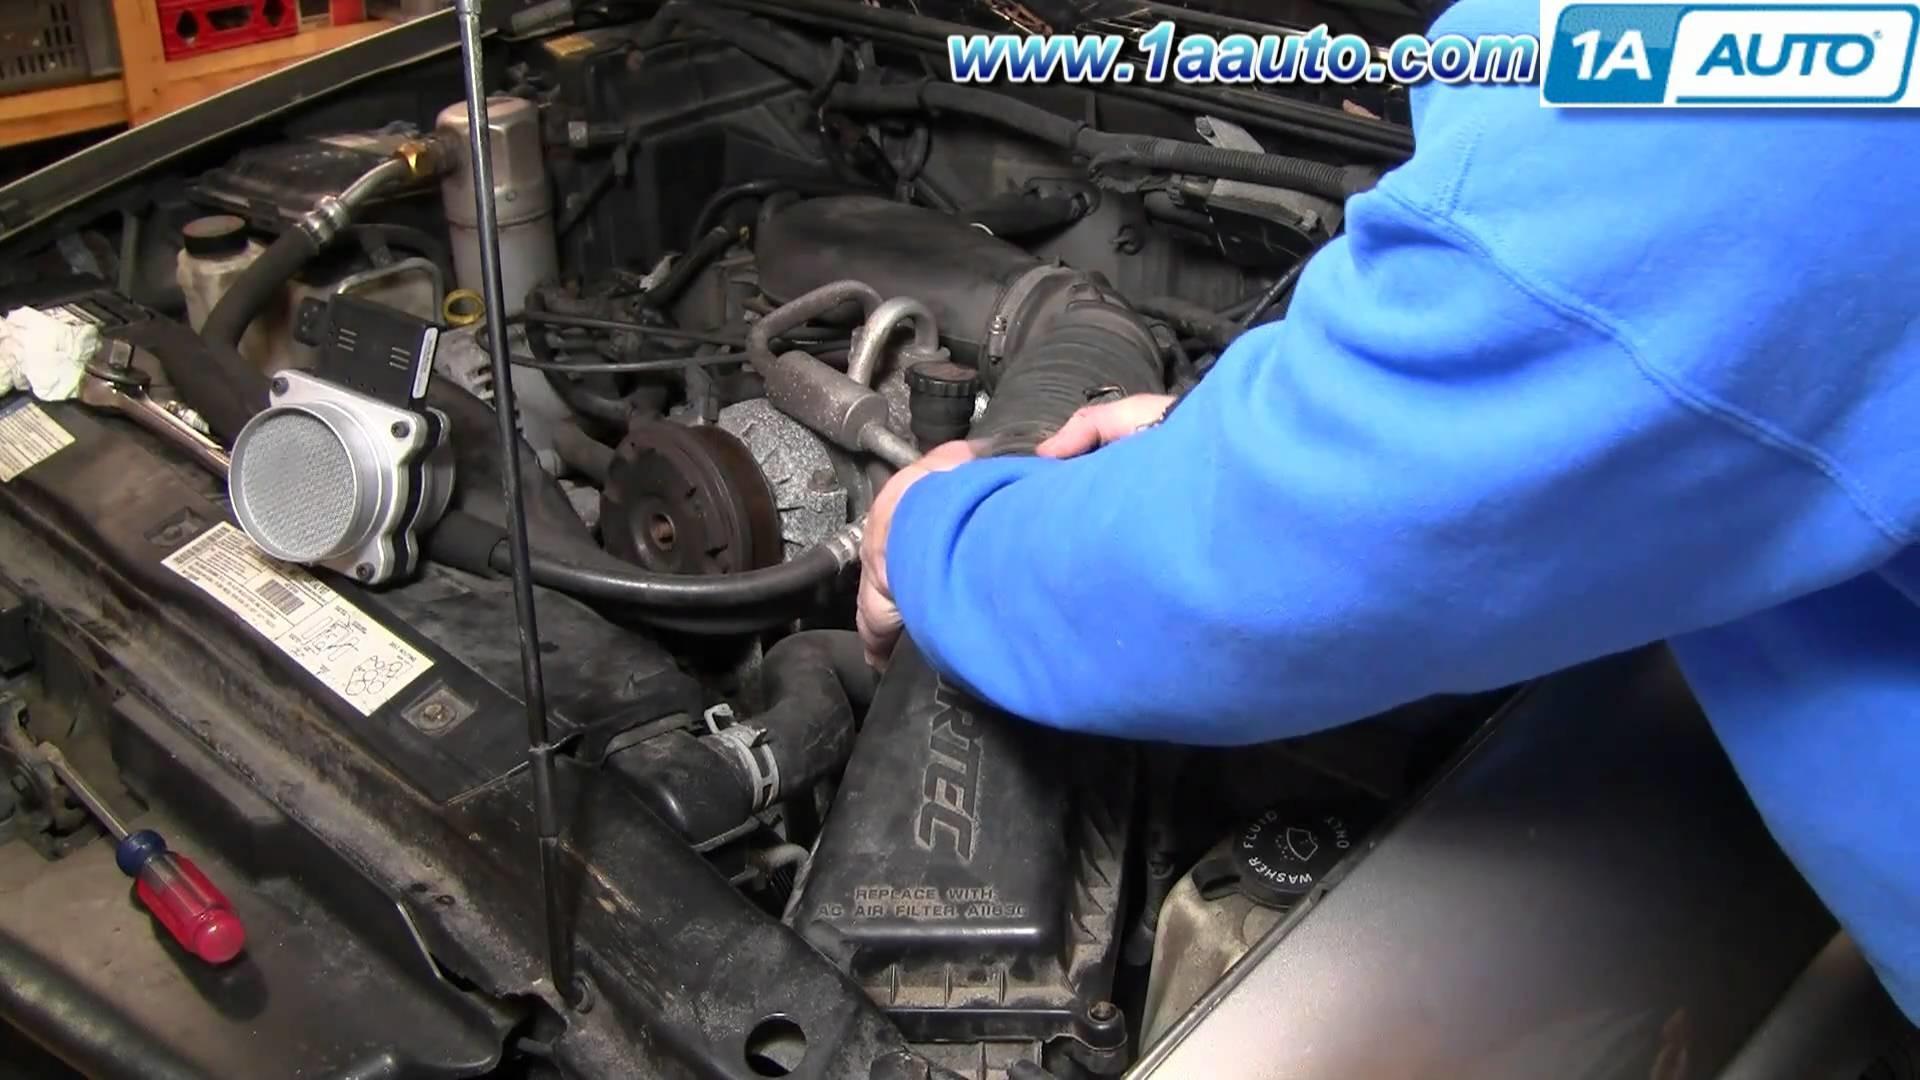 How To Install Replace Mass Air Flow Sensor Meter S10 Blazer Pickup Jimmy 4.3L 96-05 1AAuto.com